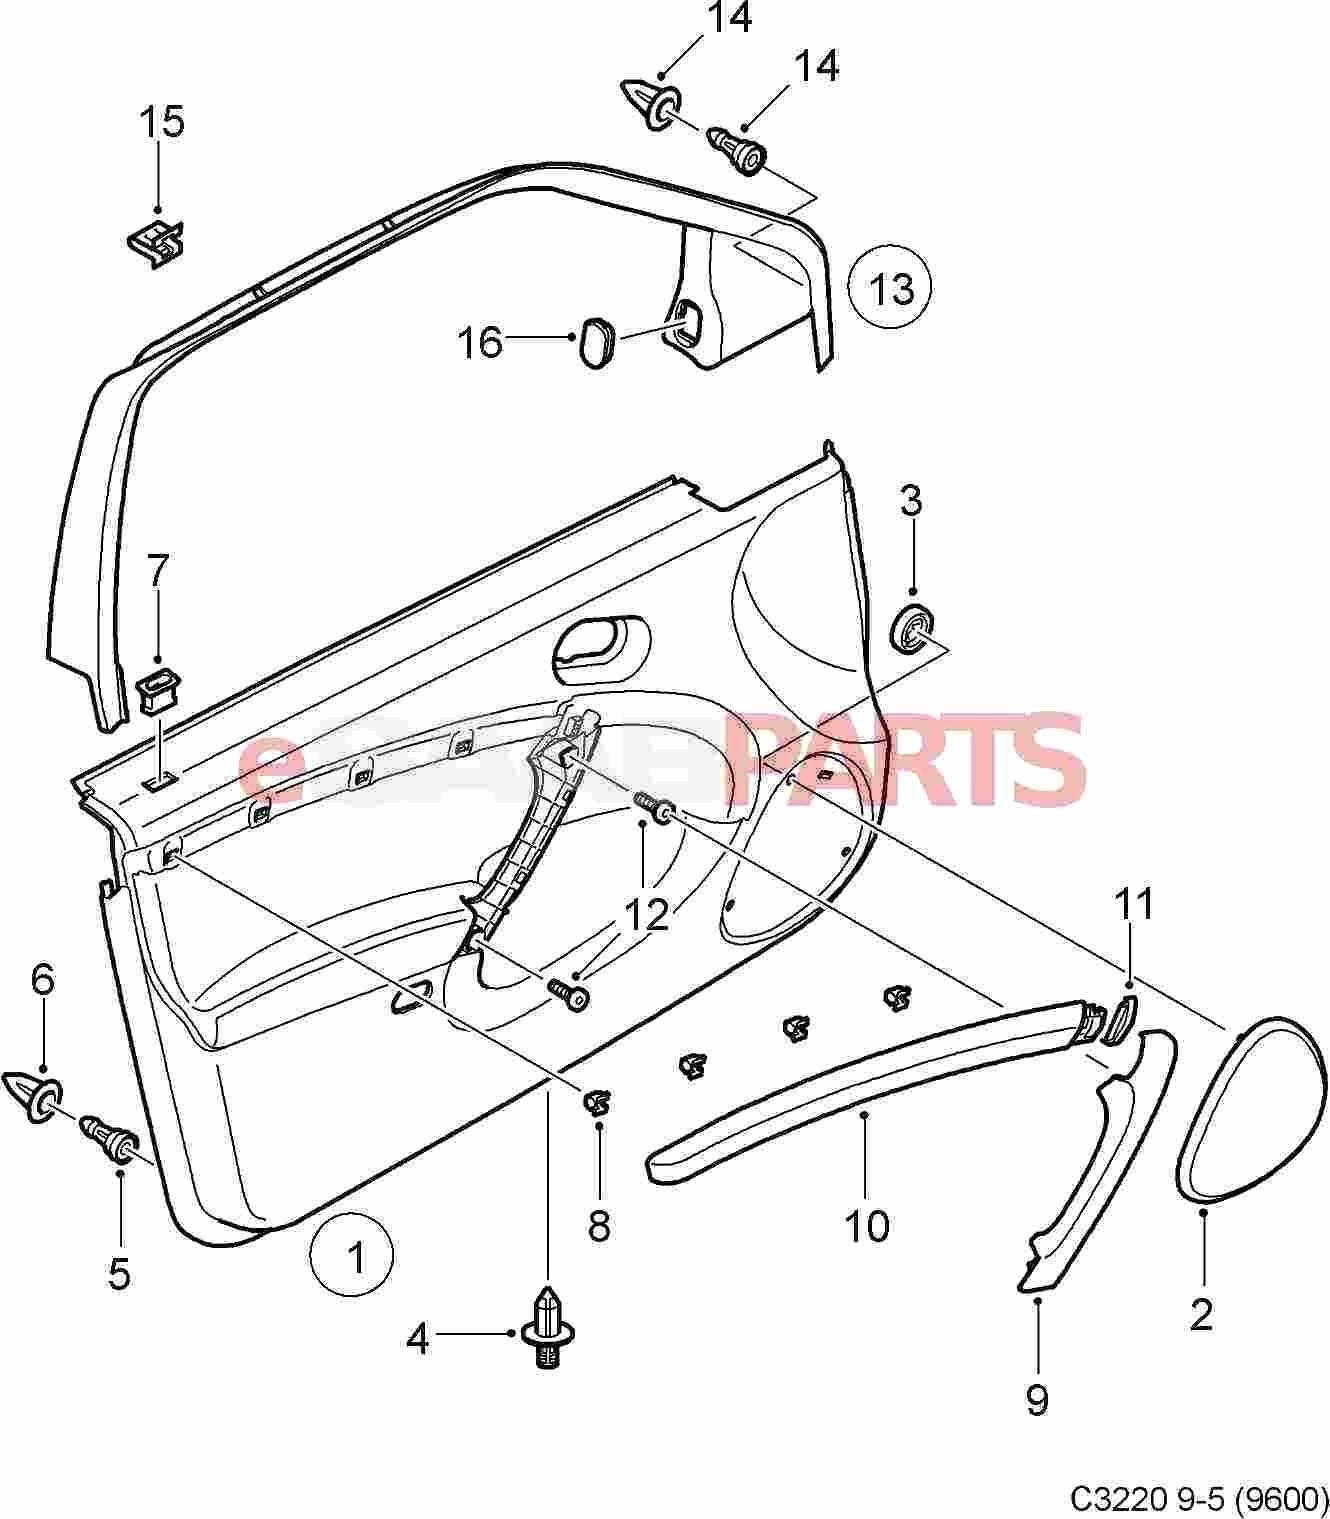 Car Undercarriage Parts Diagram Diagram Car Exterior Parts Car Exterior Body Parts Diagram Of Car Undercarriage Parts Diagram